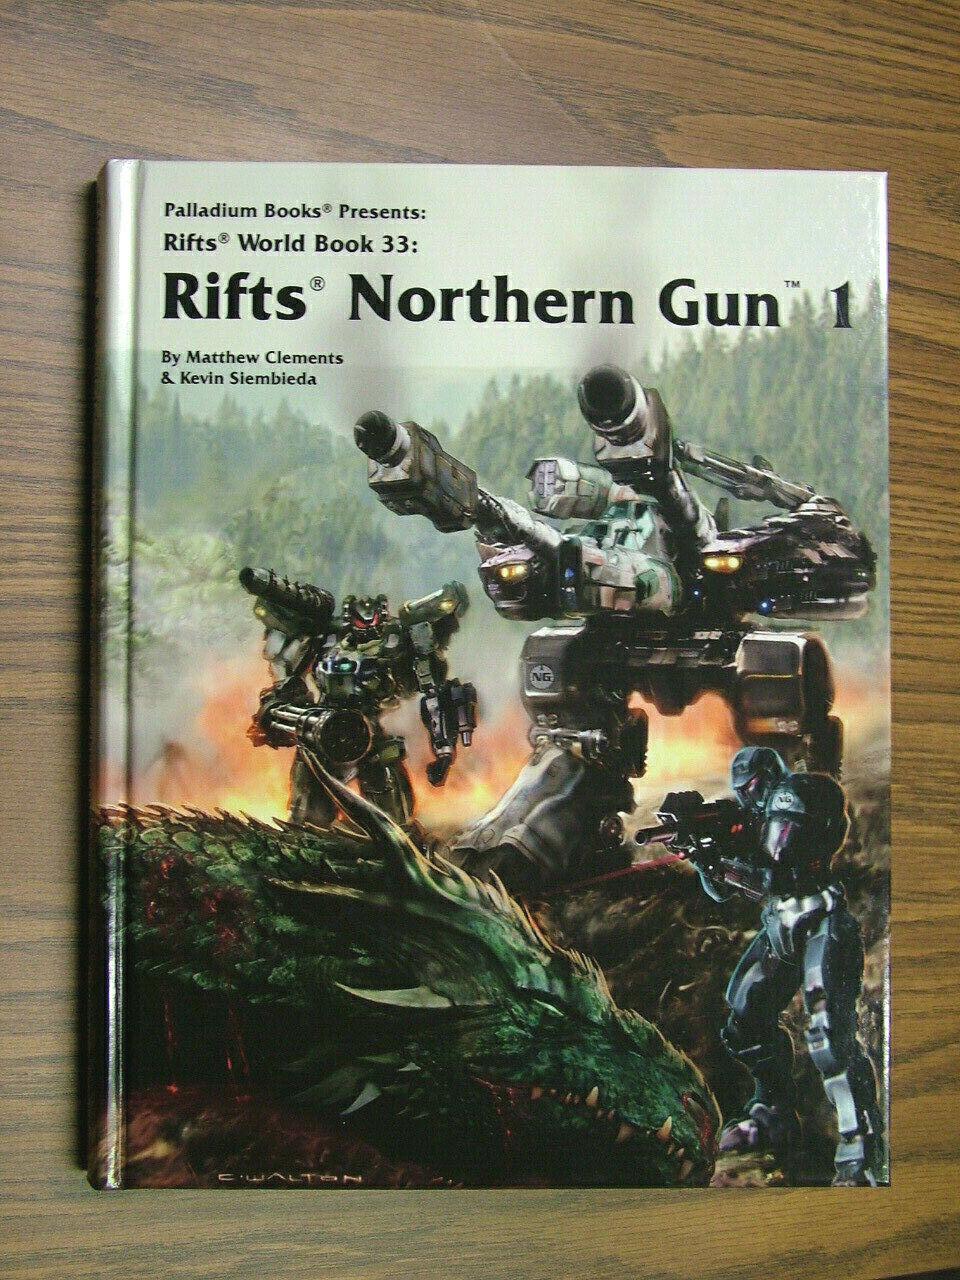 Northern Gun One, Färg Hardcover, skrivarfirma, sig.s.